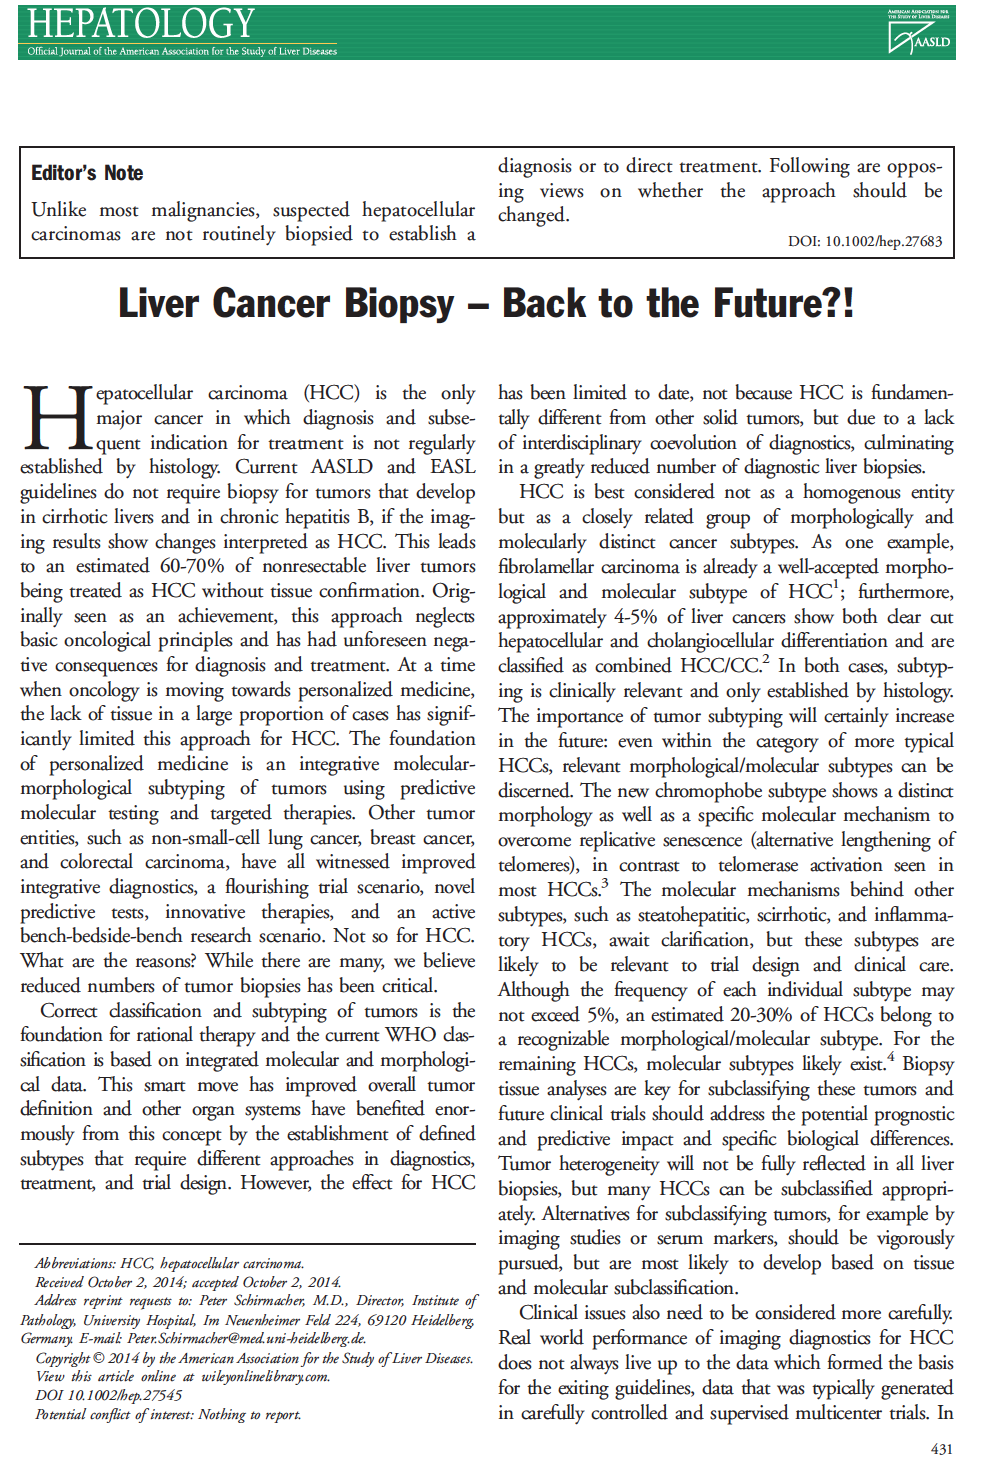 Laennec Liver Pathology Society: 2015